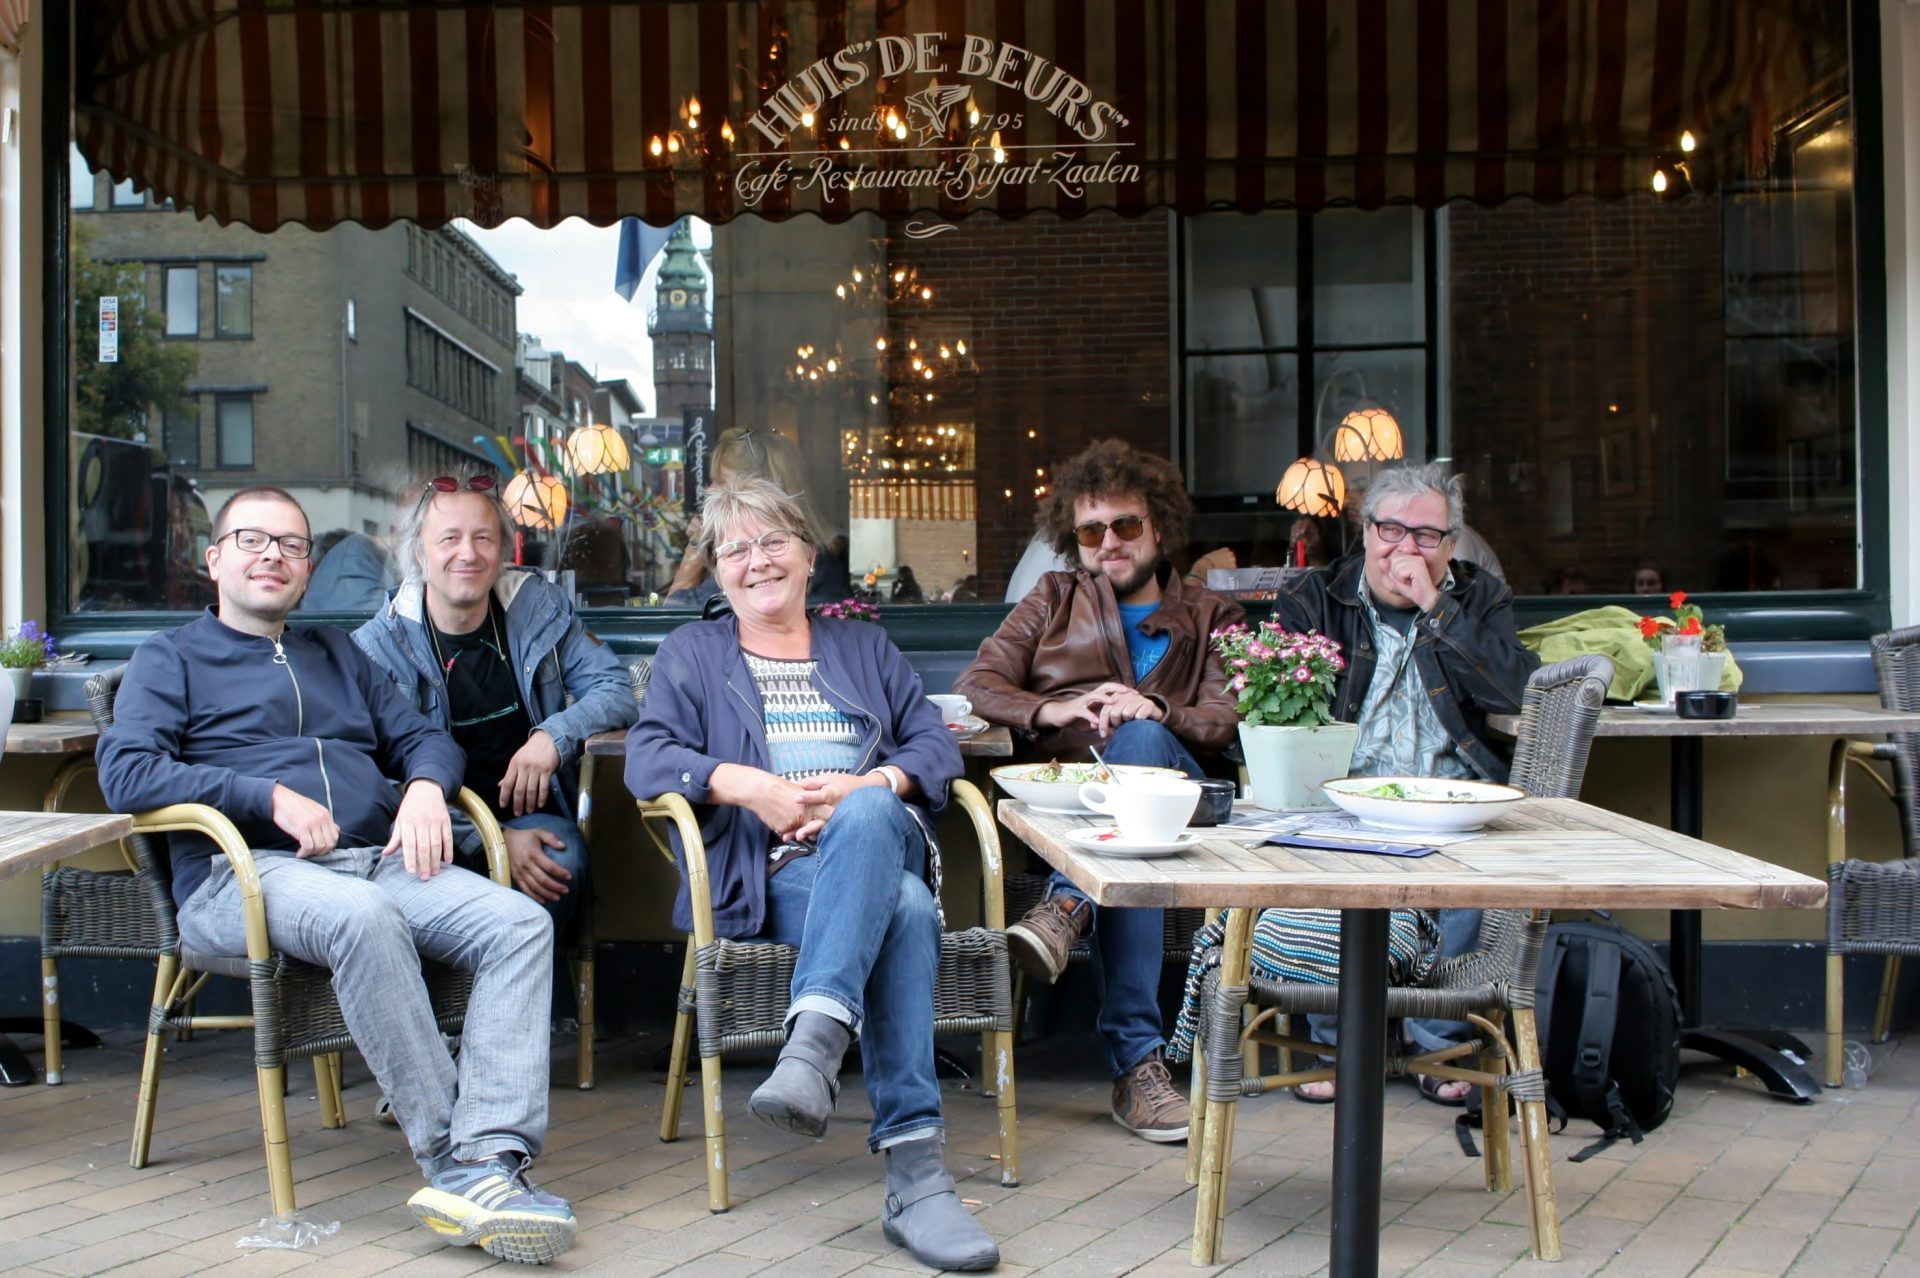 Z desne proti levi: organizator Marcel Roelofs, Janez Dovč, organizatorka Evelien Brak, Nino Mureškič in Goran Krmac. Foto: Dejan Pušenjak